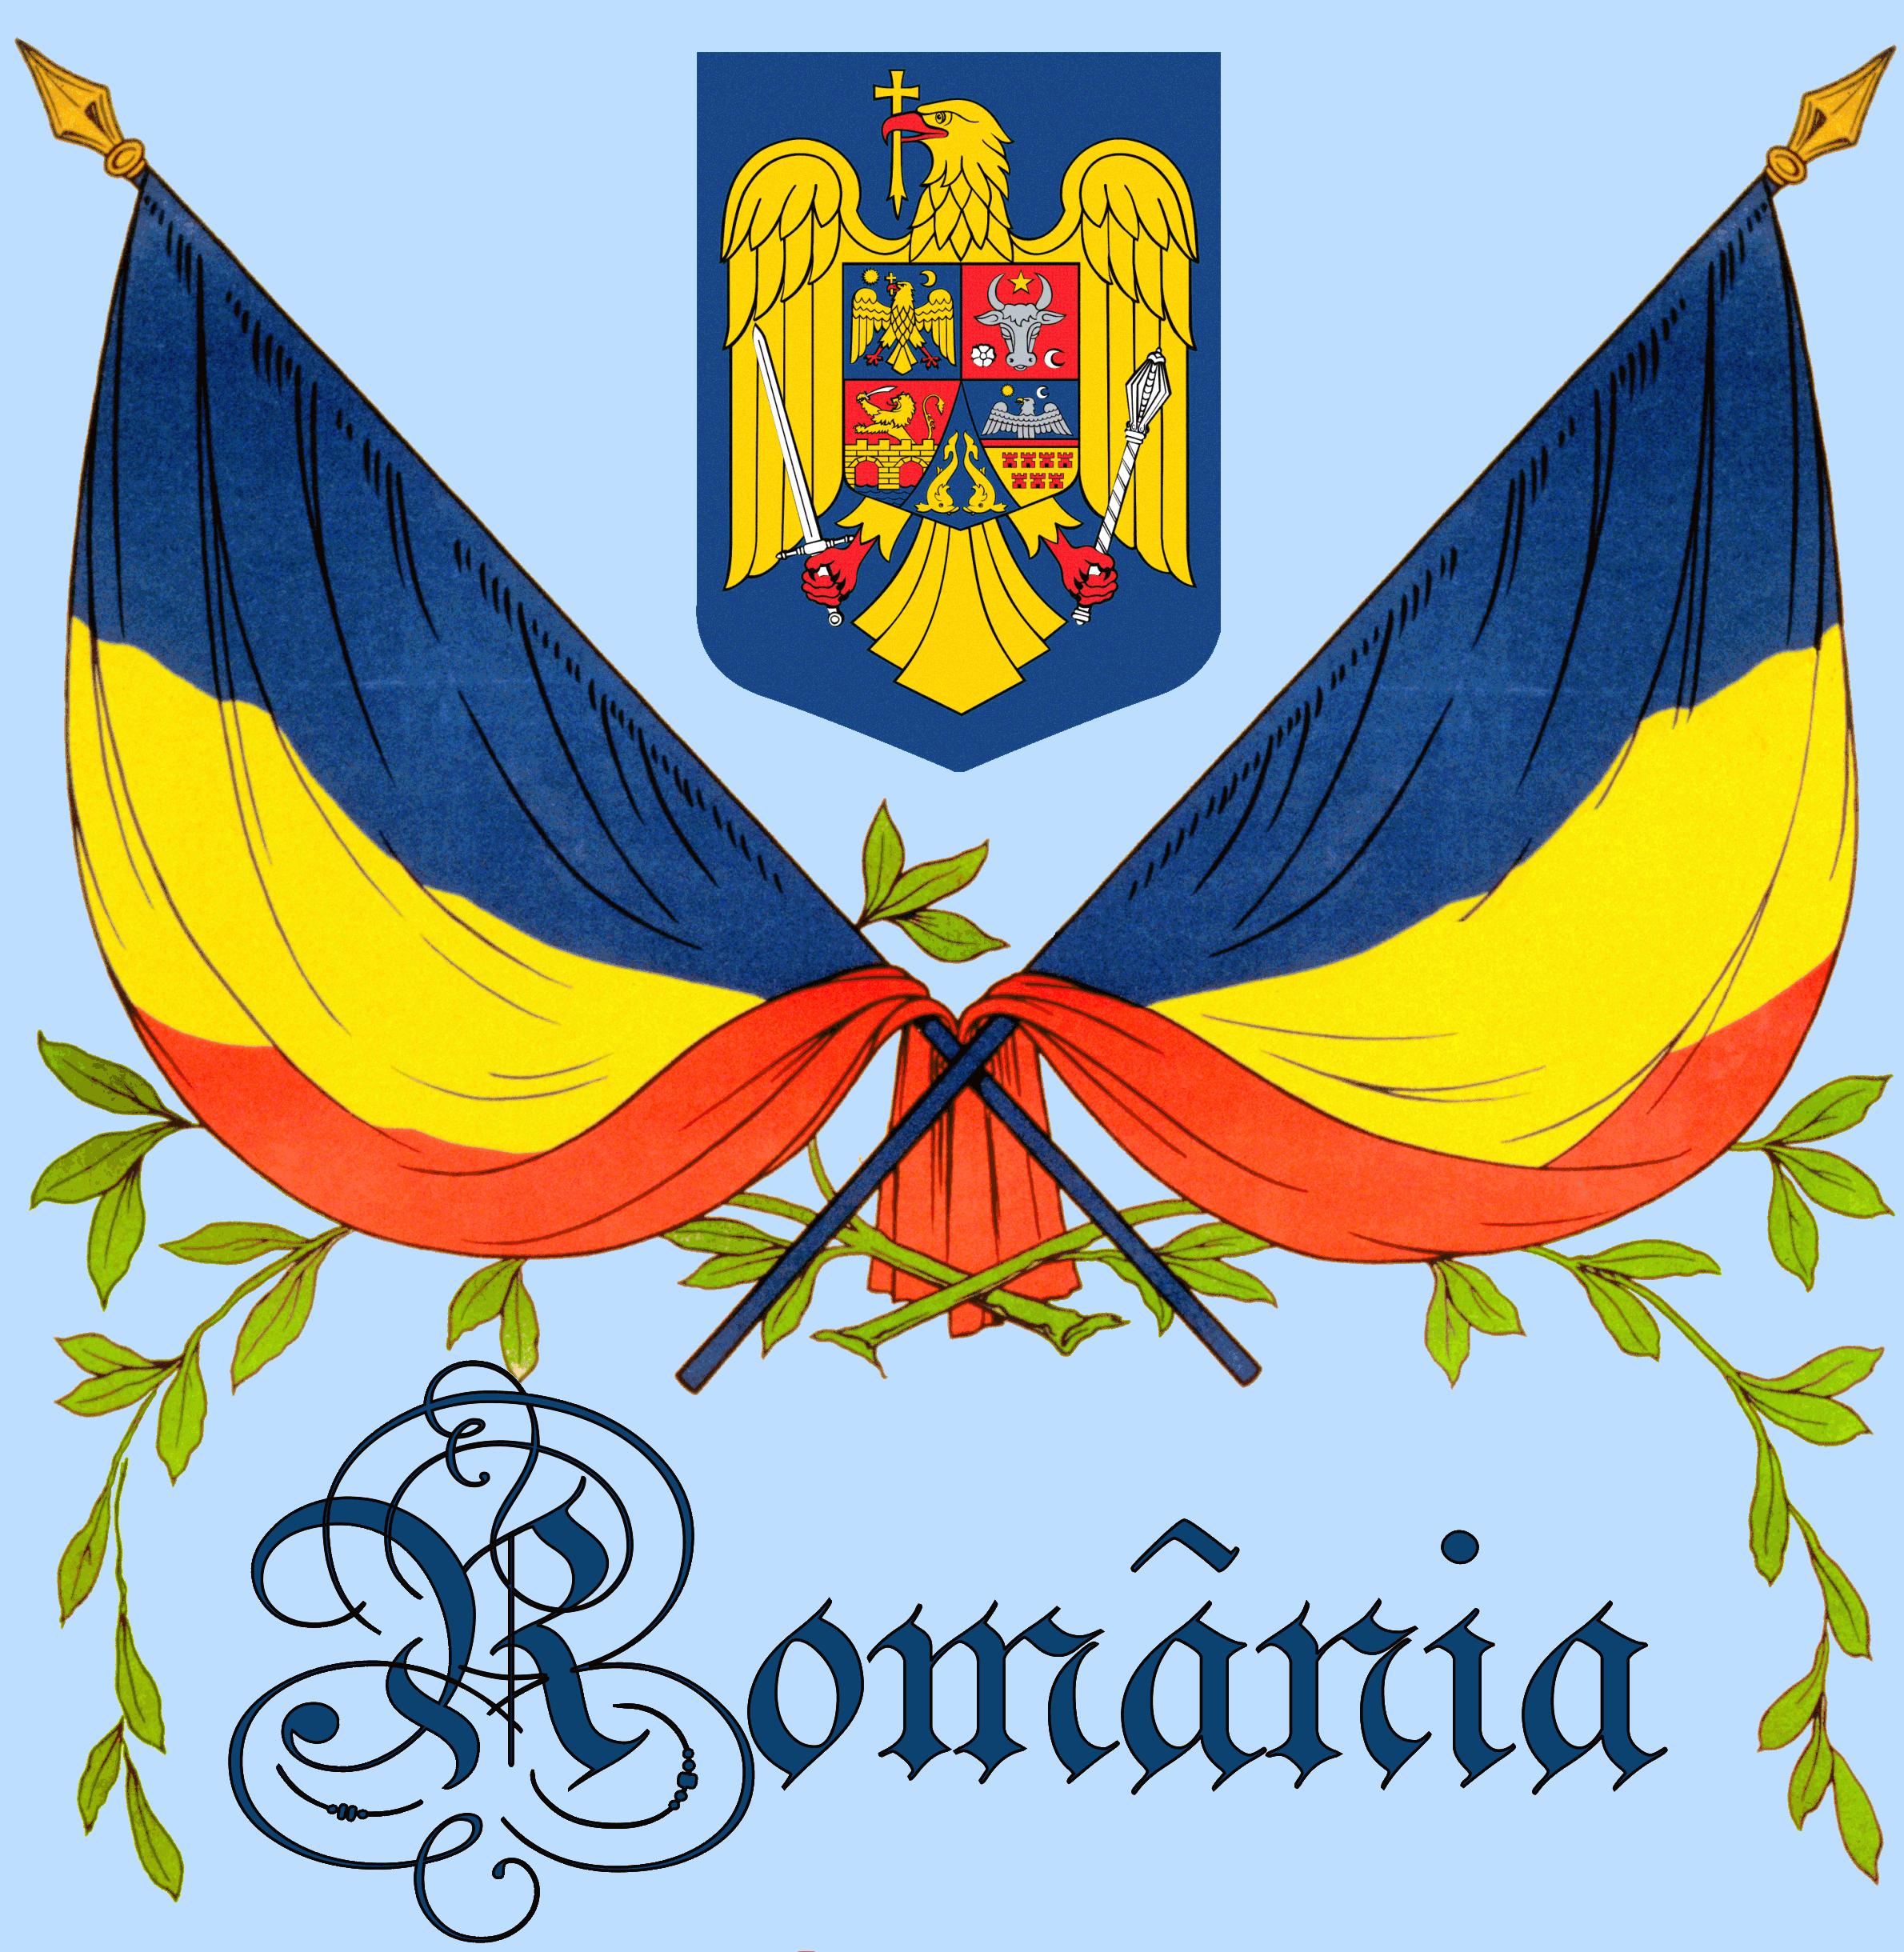 [url=https://flic.kr/p/KEcThT][img]https://farm2.staticflickr.com/1786/28655686647_b6e5e48c83_o.png[/img][/url][url=https://flic.kr/p/KEcThT]Symbols_of_Romania[/url] by [url=https://www.flickr.com/photos/am-jochim/]Mark Jochim[/url], on Flickr